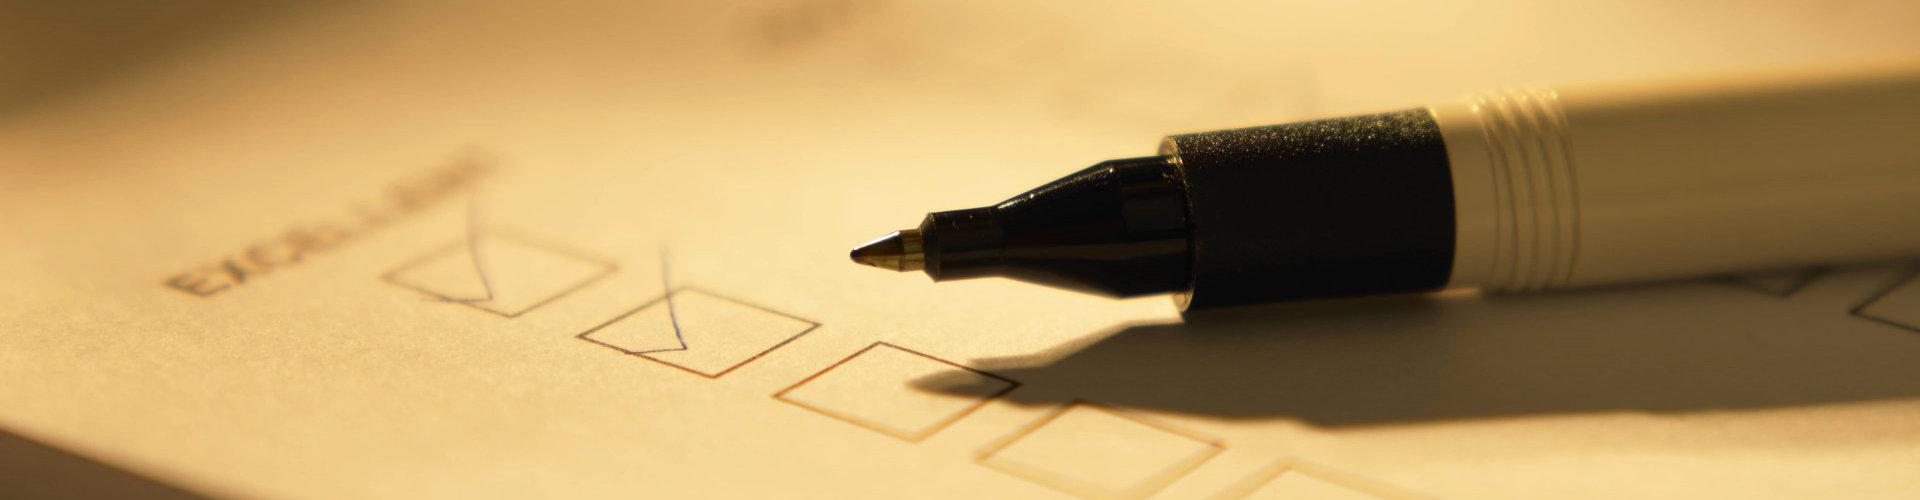 pen on top of a survey sheet